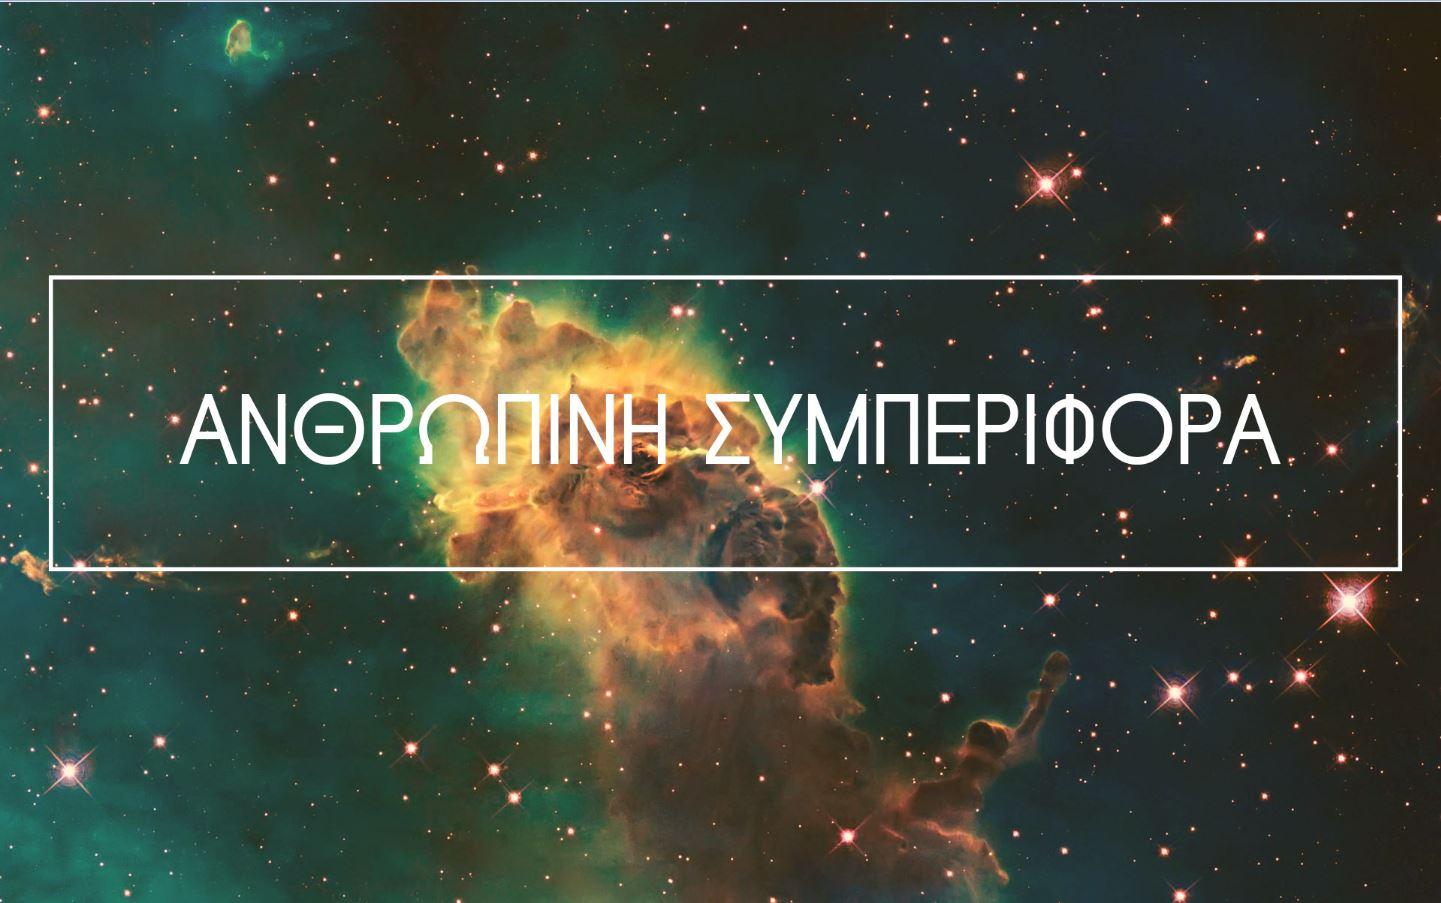 anthrwpinh-sumperifora-1-1